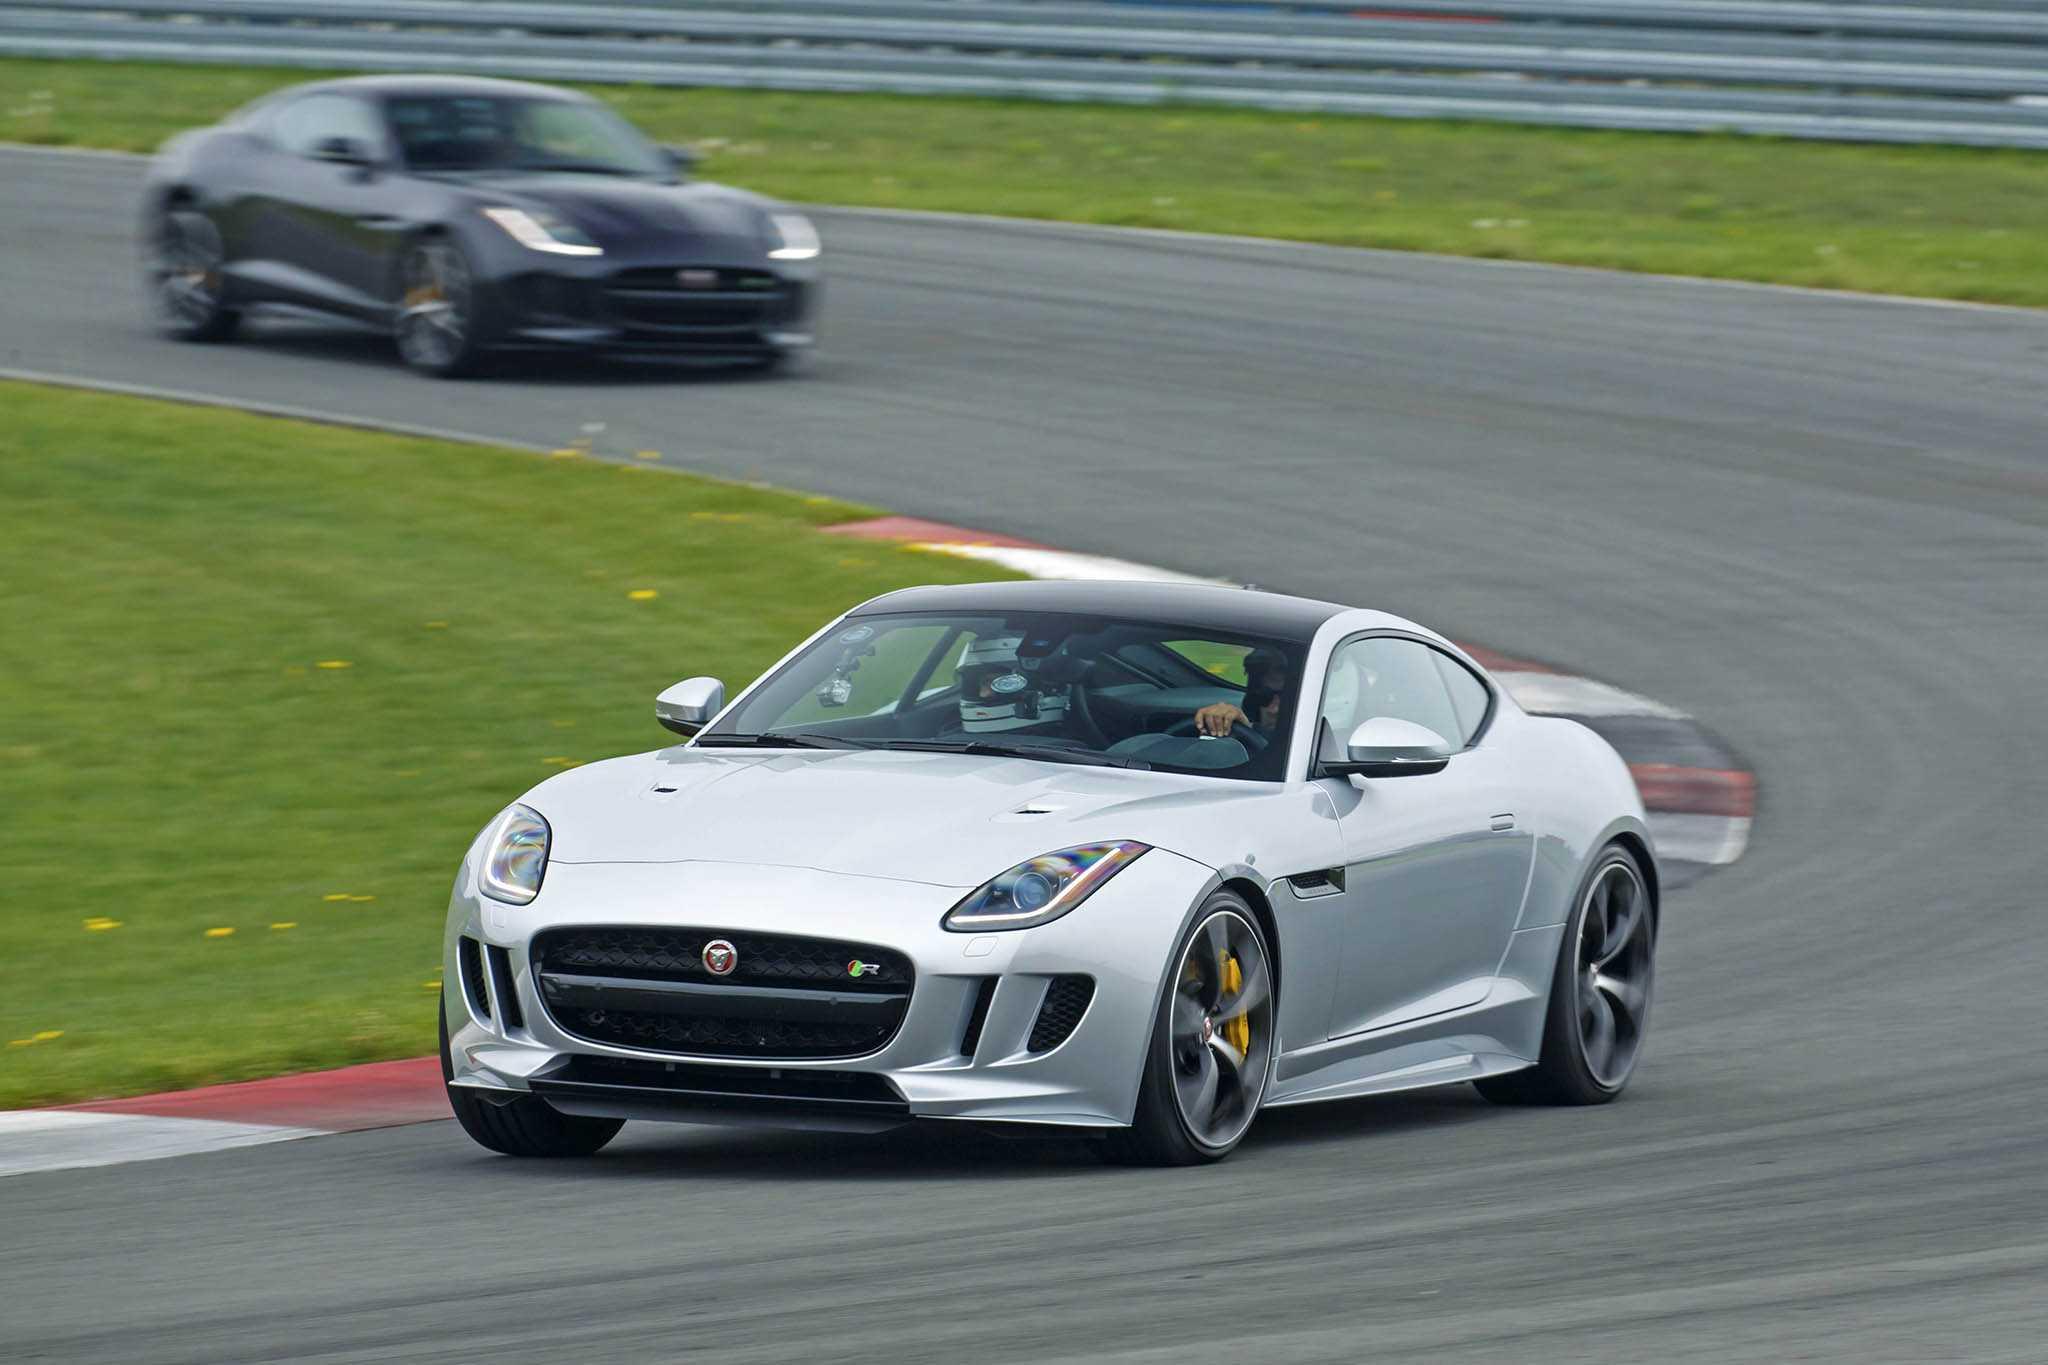 Jaguar Considering Multiple New Models, New XJ Included